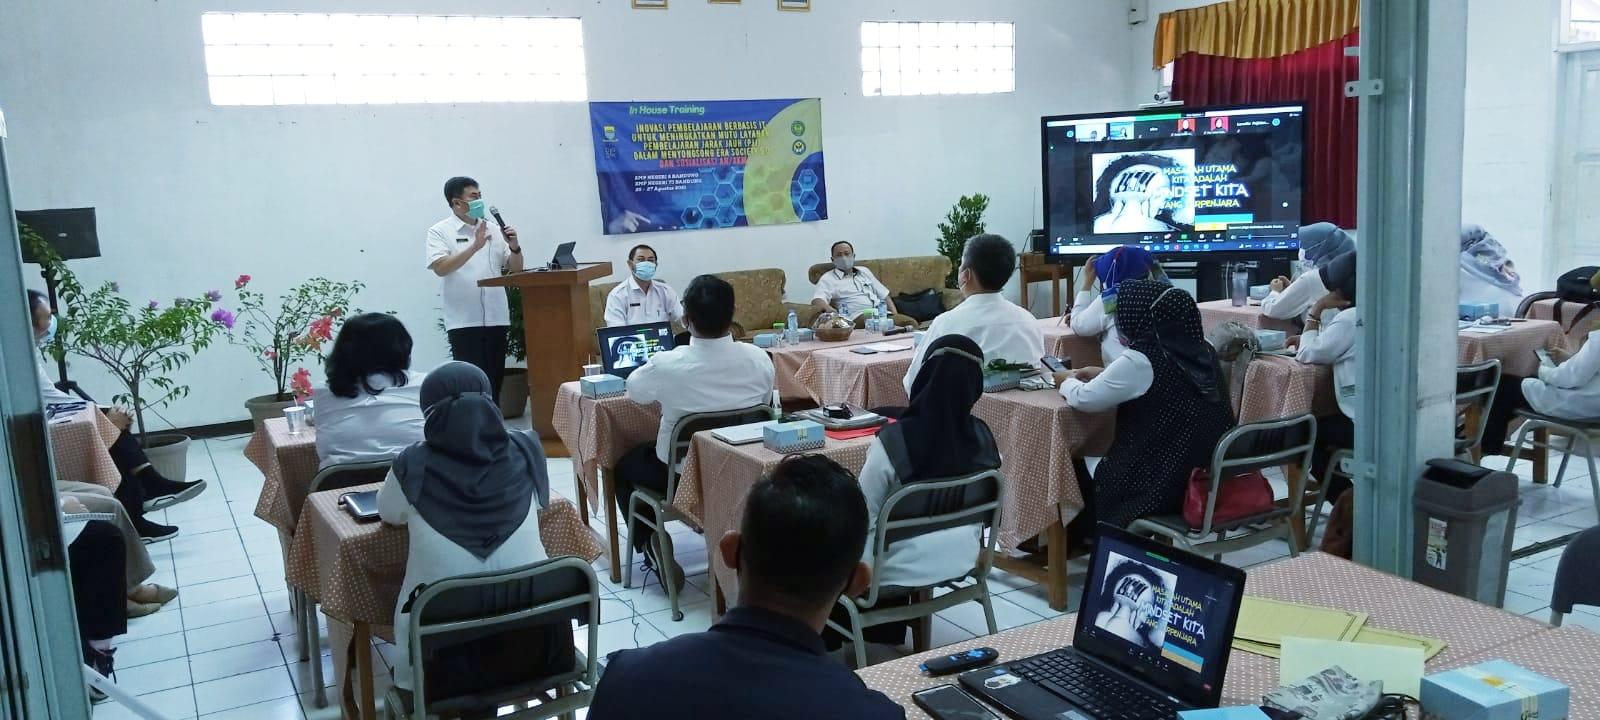 Inovasi Pembelajaran Berbasis IT untuk Meningkatkan Mutu Layanan Pembelajaran Jarak Jauh ( PJJ ) dalam Menyongsong Era Society 5.0